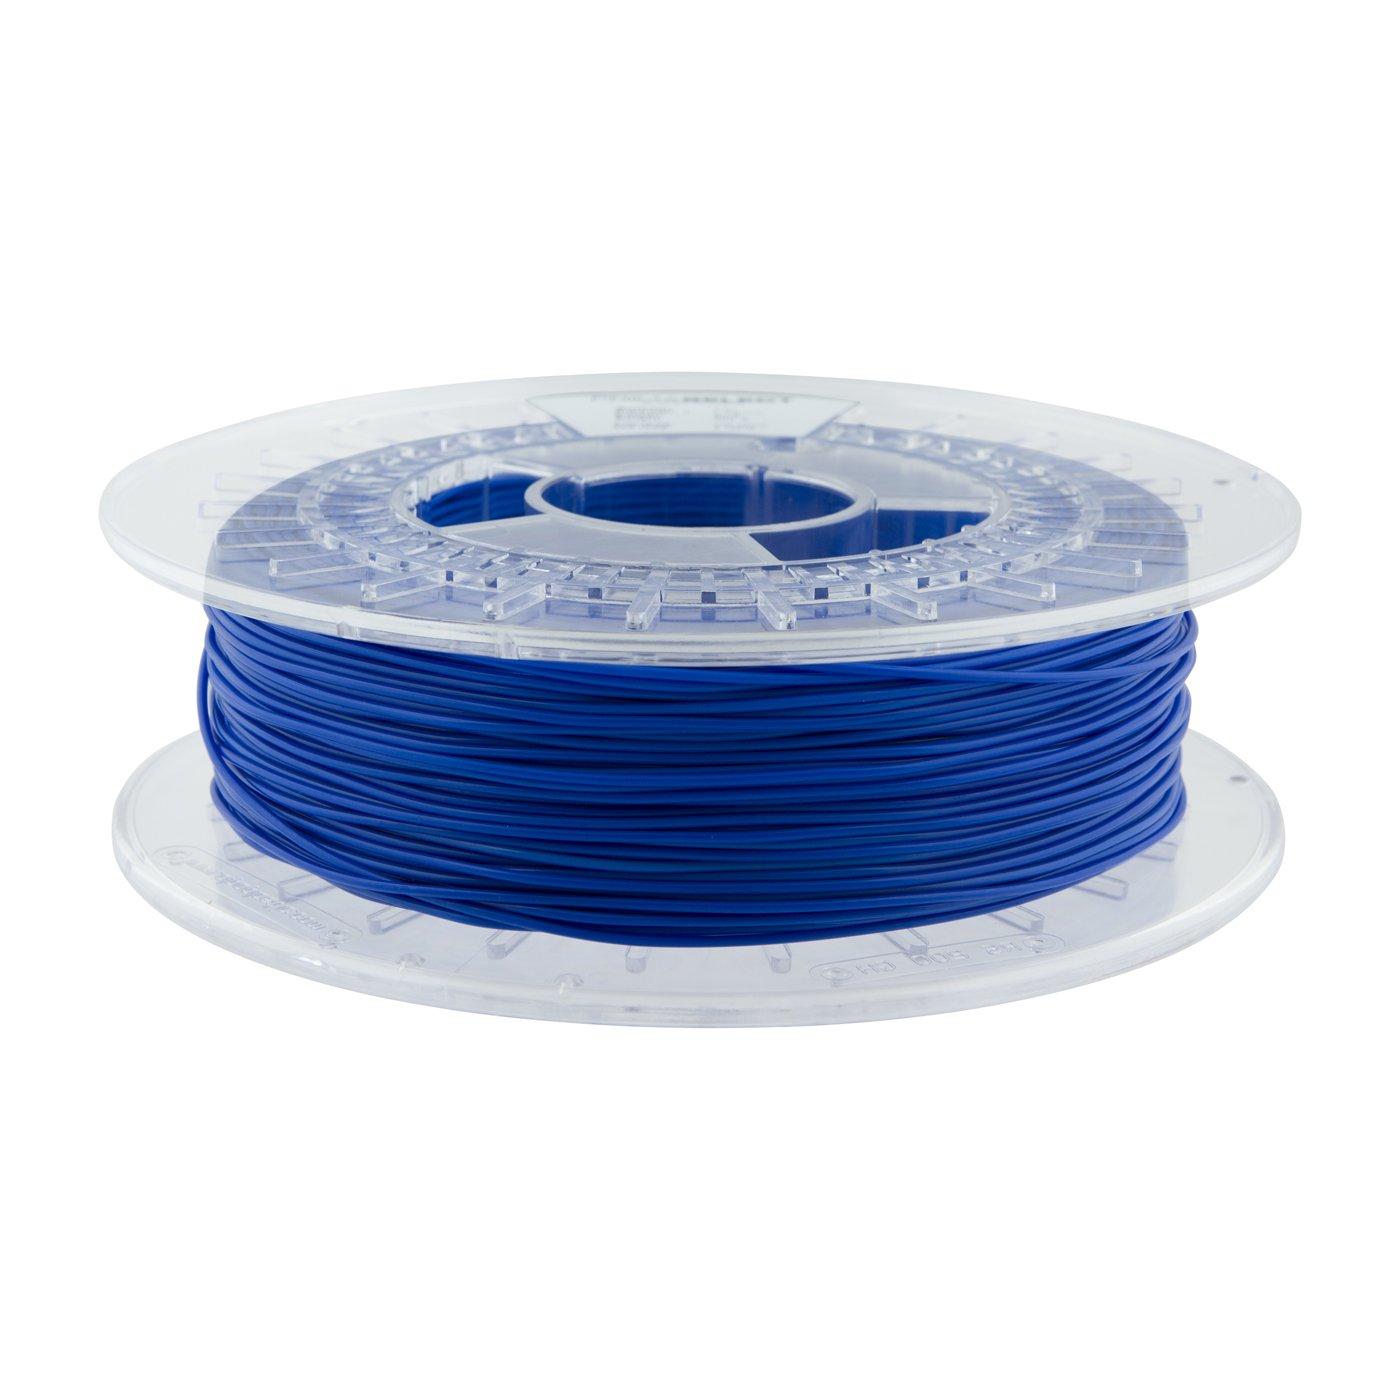 Filamento de limpieza para impresora 3D 1,75 mm, 50 g AprintaPro